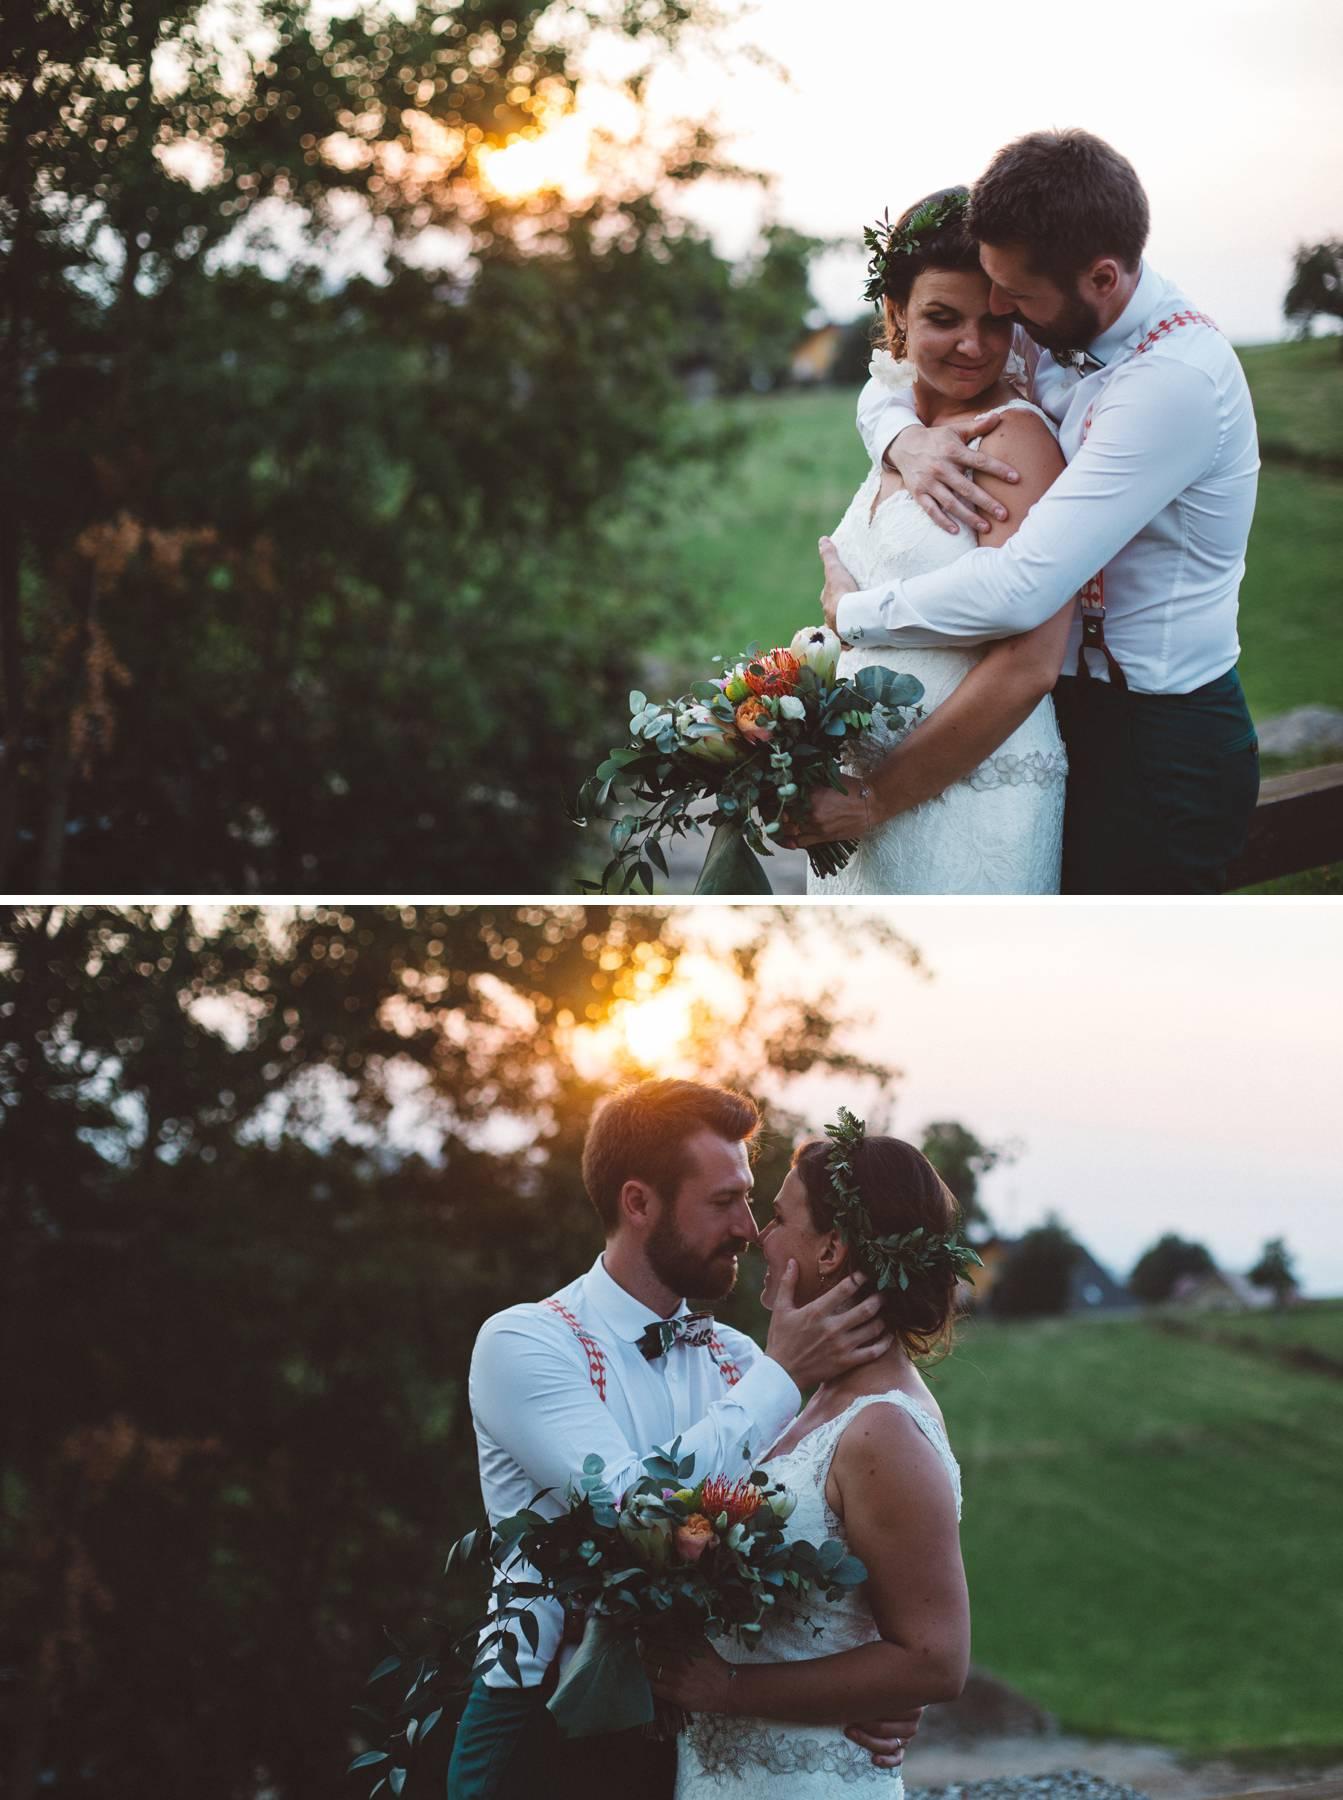 mariage-tropical-raben-horben_0034.jpg